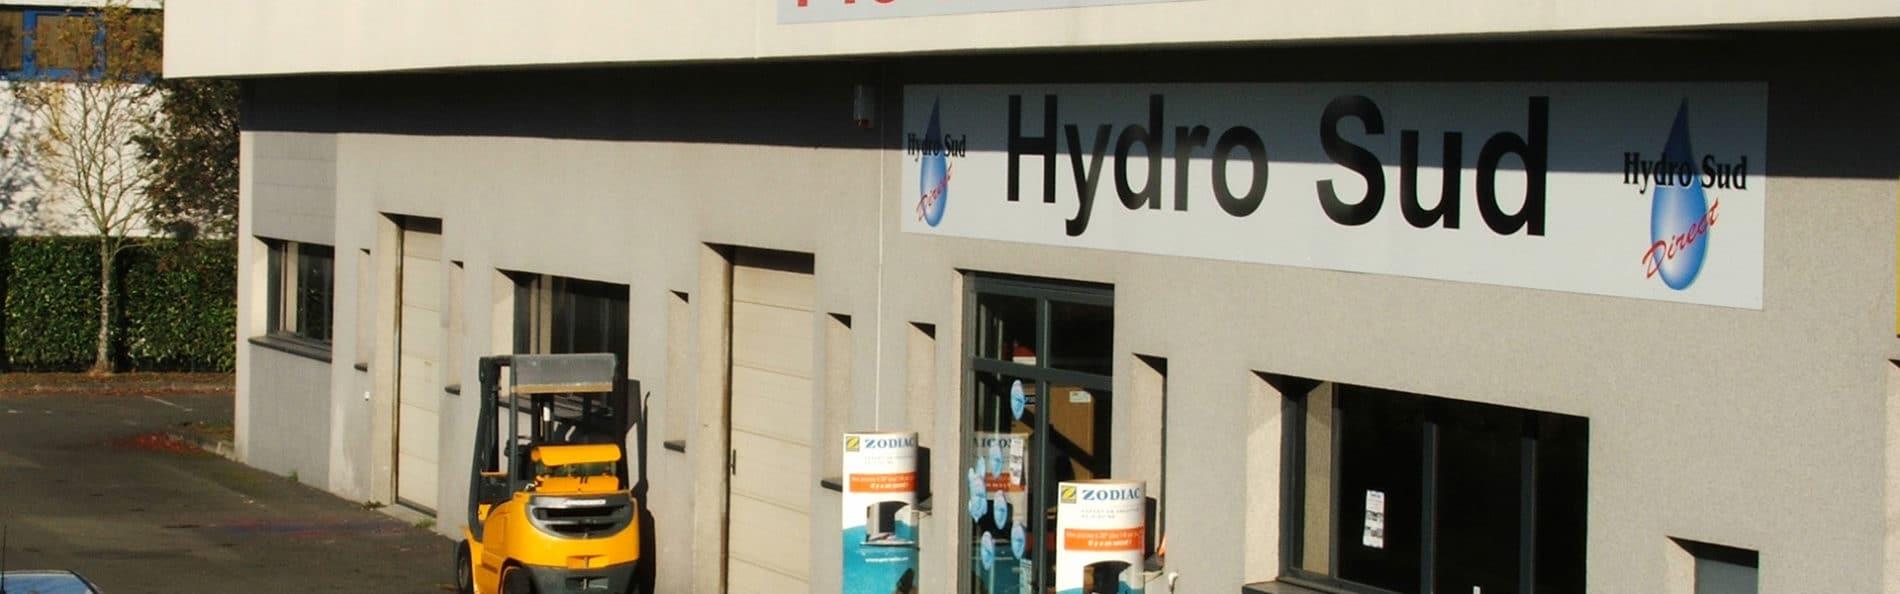 Hydro Sud Plaisir